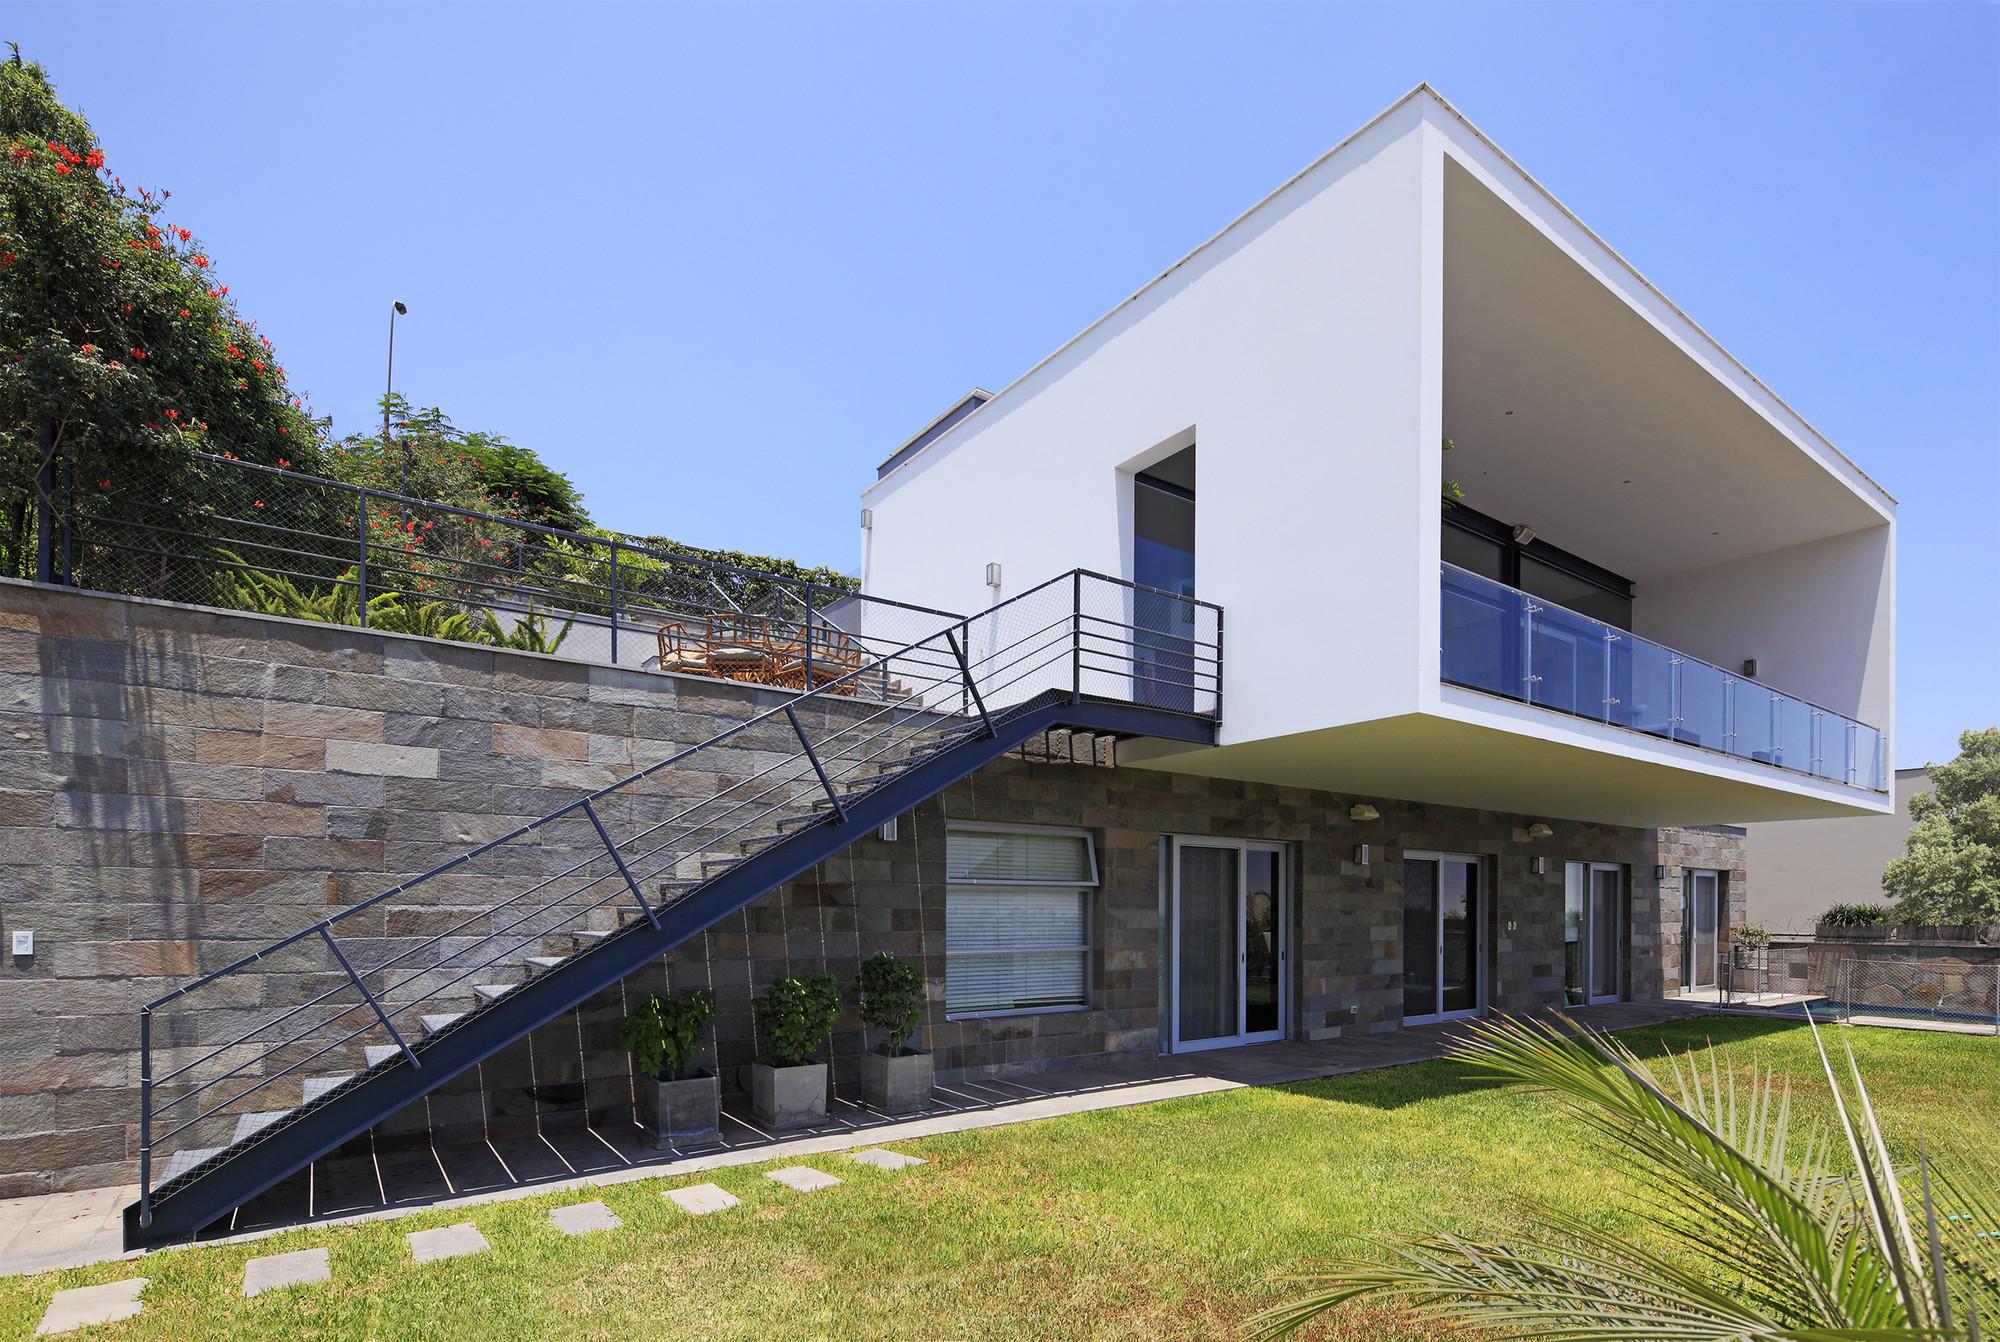 Galeria de casa b domenack arquitectos 1 for Arquitectos para casas